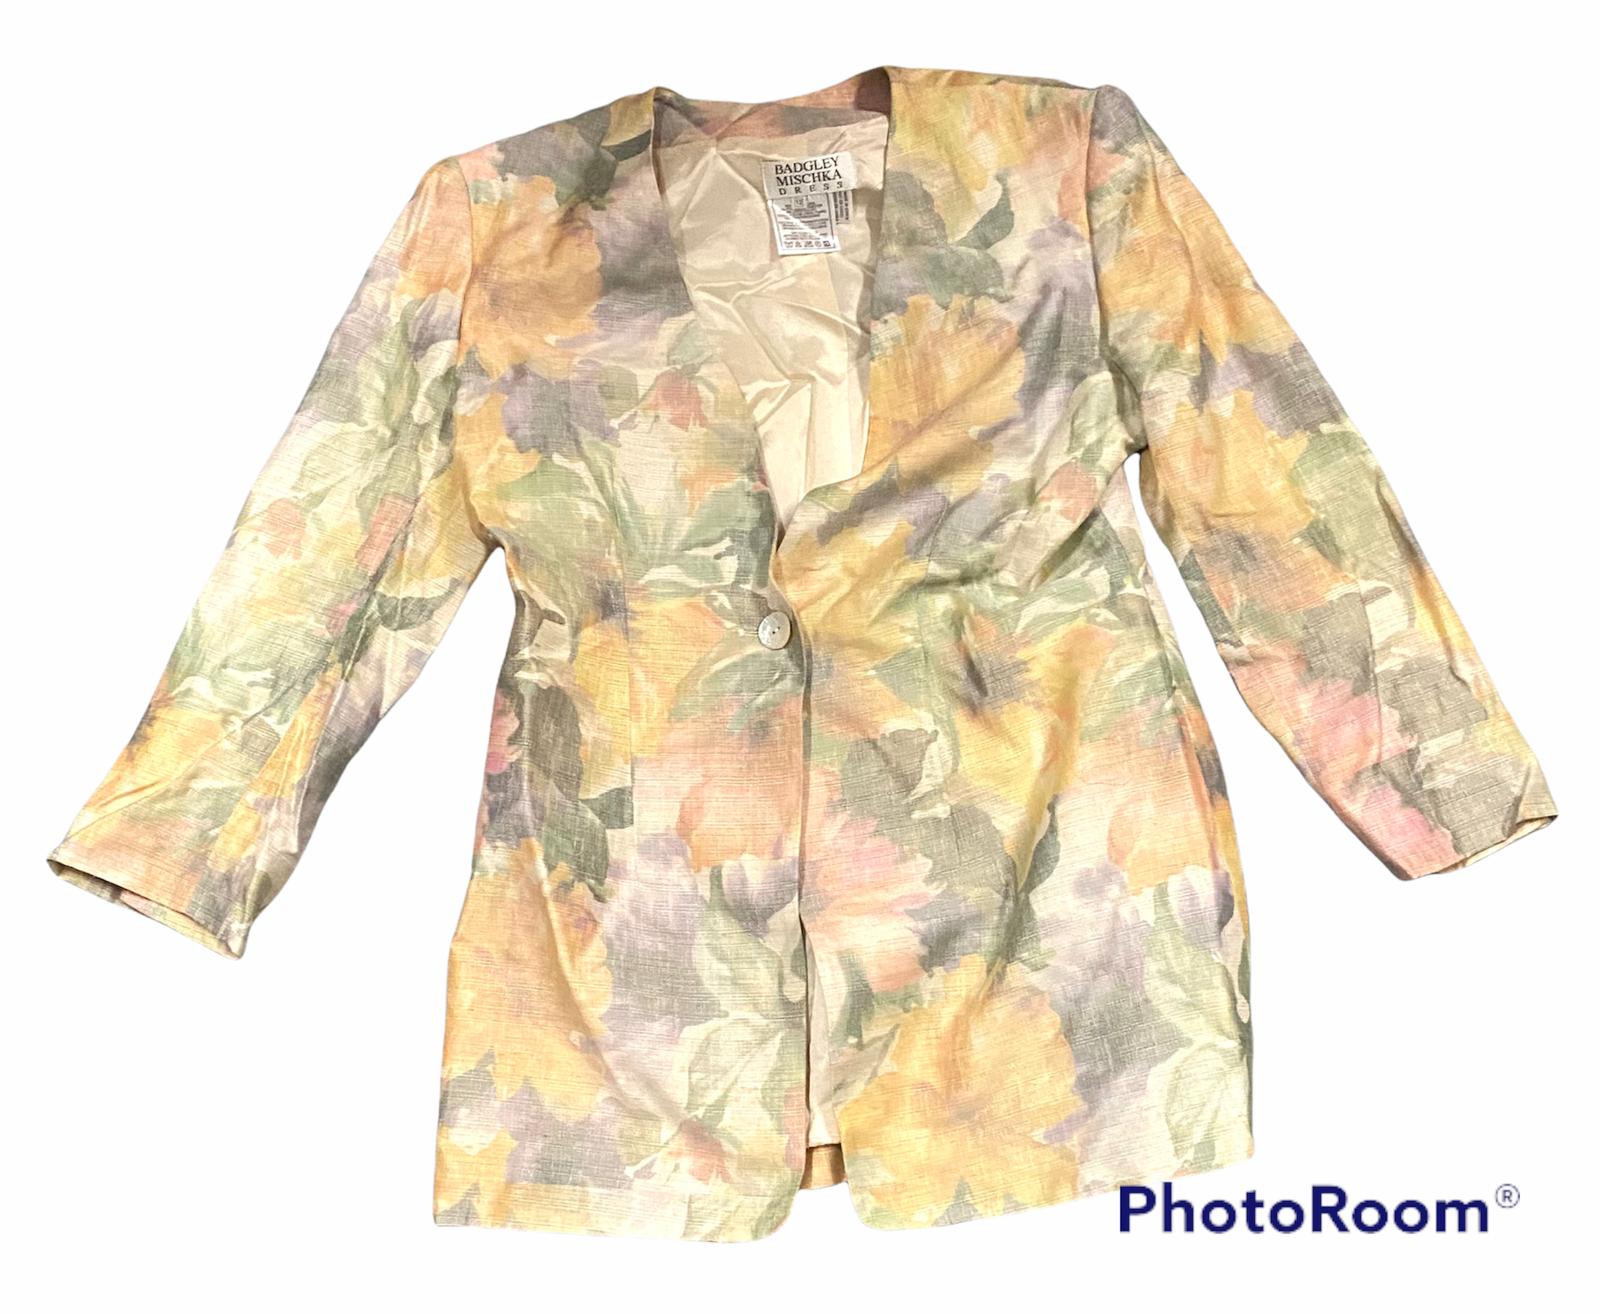 BADGLEY MISCHKA Floral Jacket Blazer Long Sleeve Woman's Multi-Color Size 12